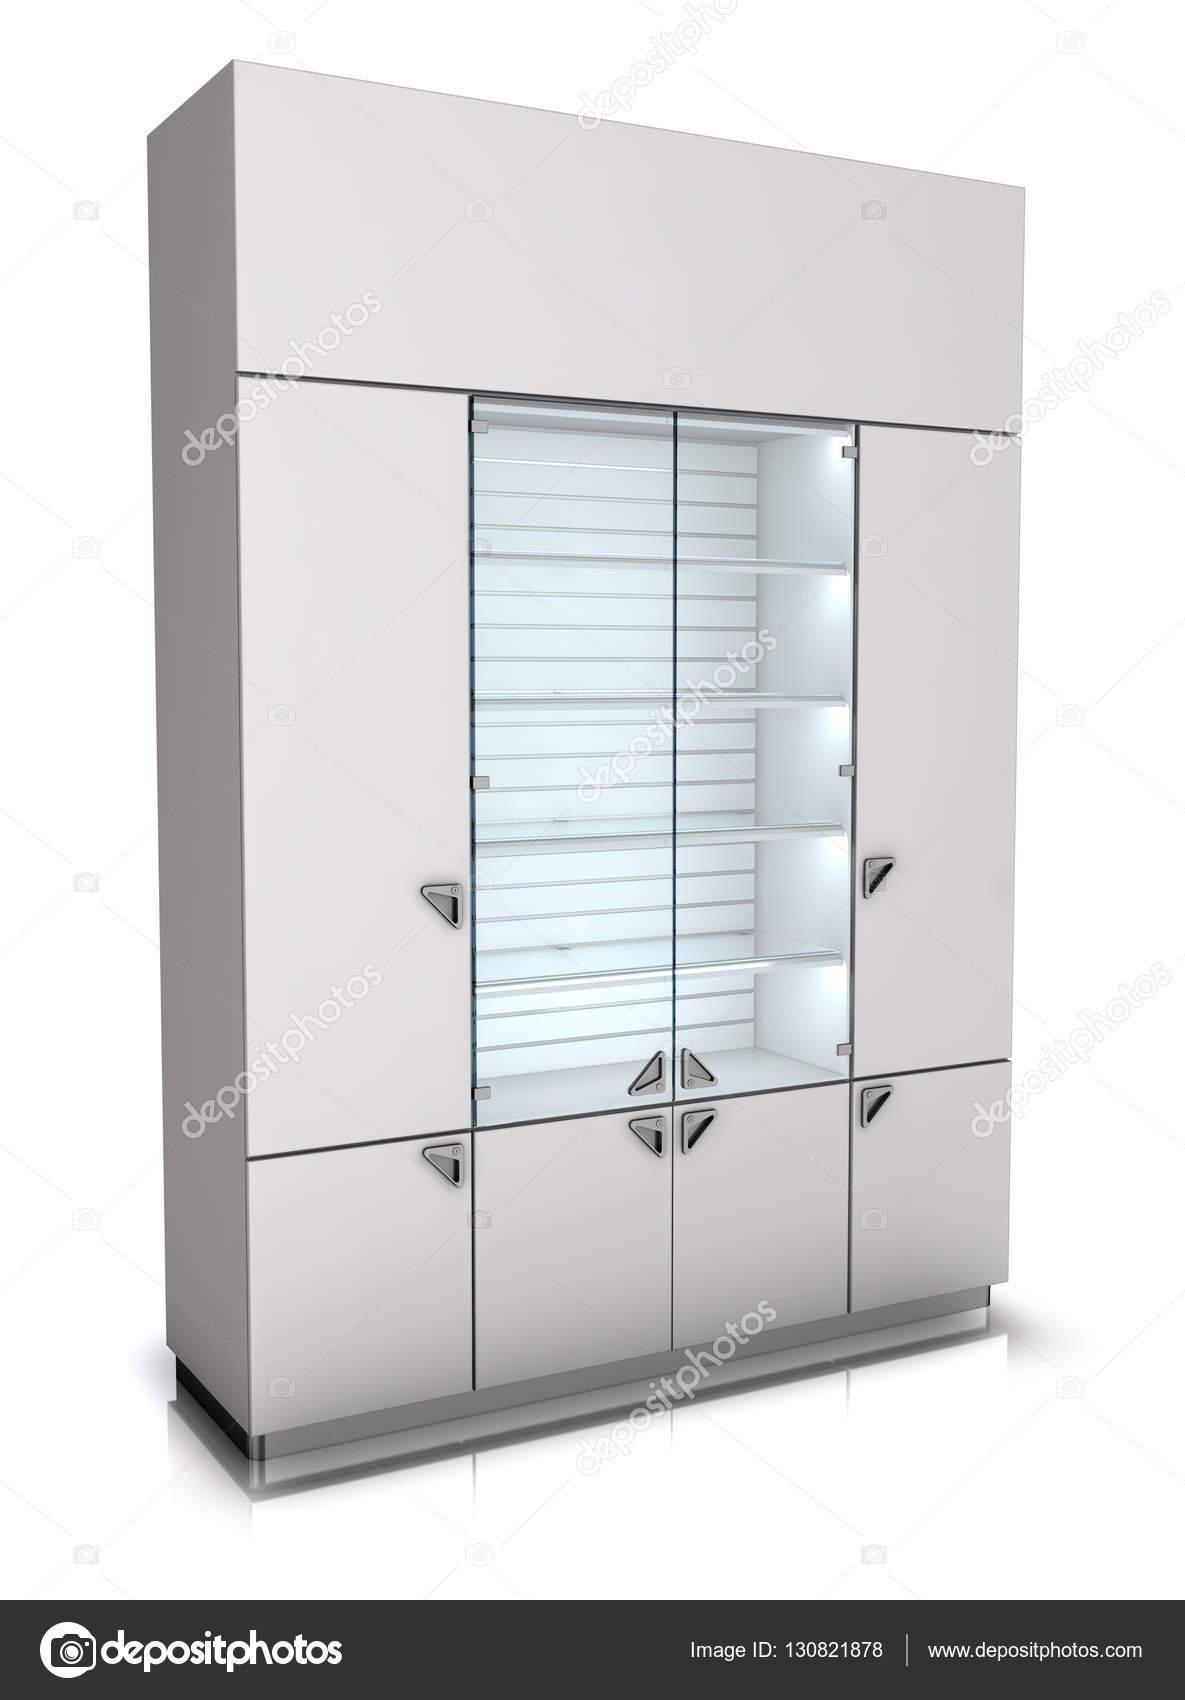 Vitrine Boekenkast Wit.Cabinet With A Glass Showcase 3d Image Stock Photo C Wir0man